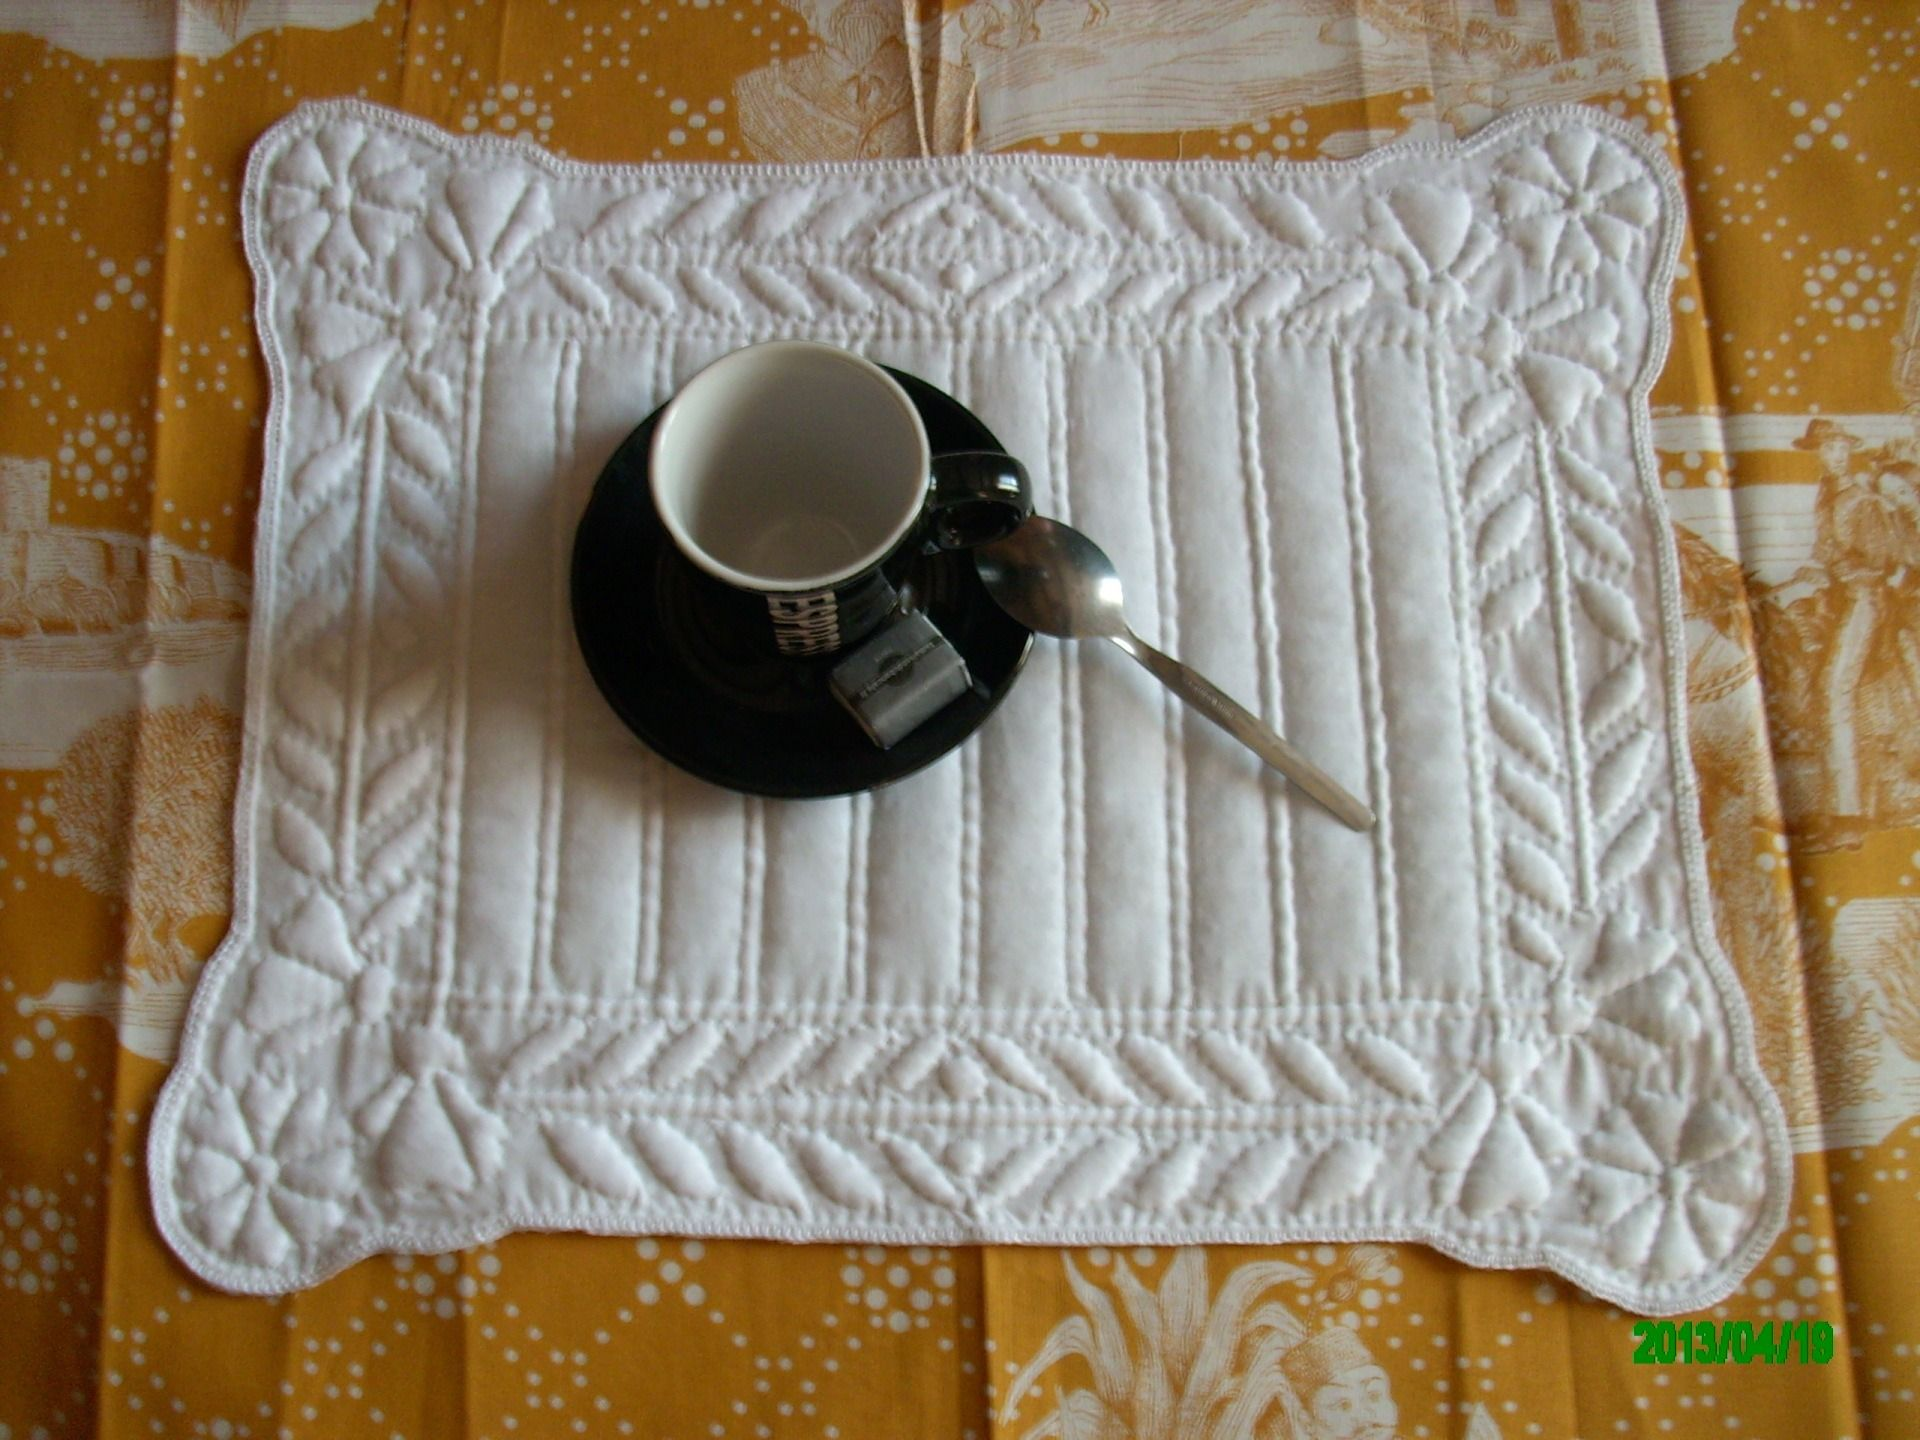 boutis proven al set de table blanc boutis french quilting trapunto pinterest boutis. Black Bedroom Furniture Sets. Home Design Ideas